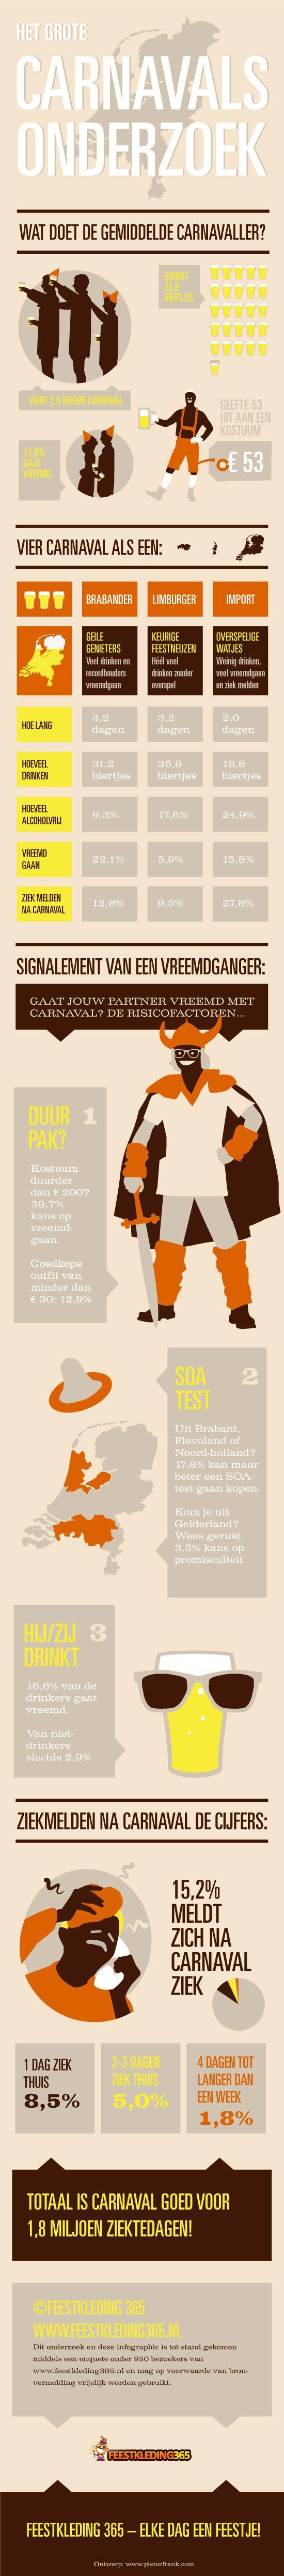 Carnavalsonderzoek infographic